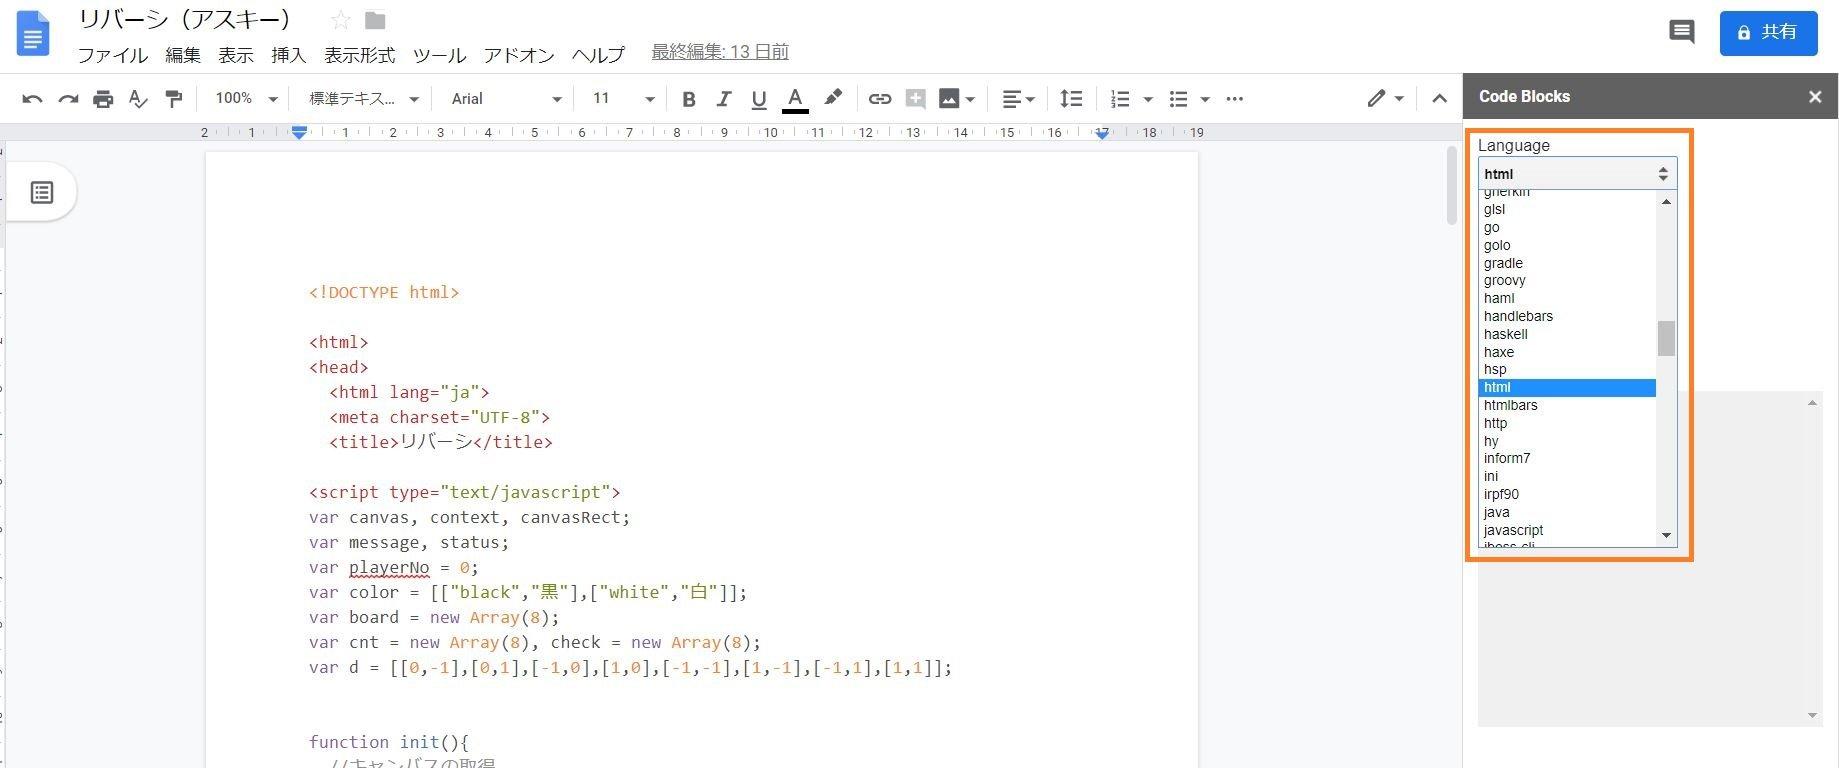 Code Blocks Language